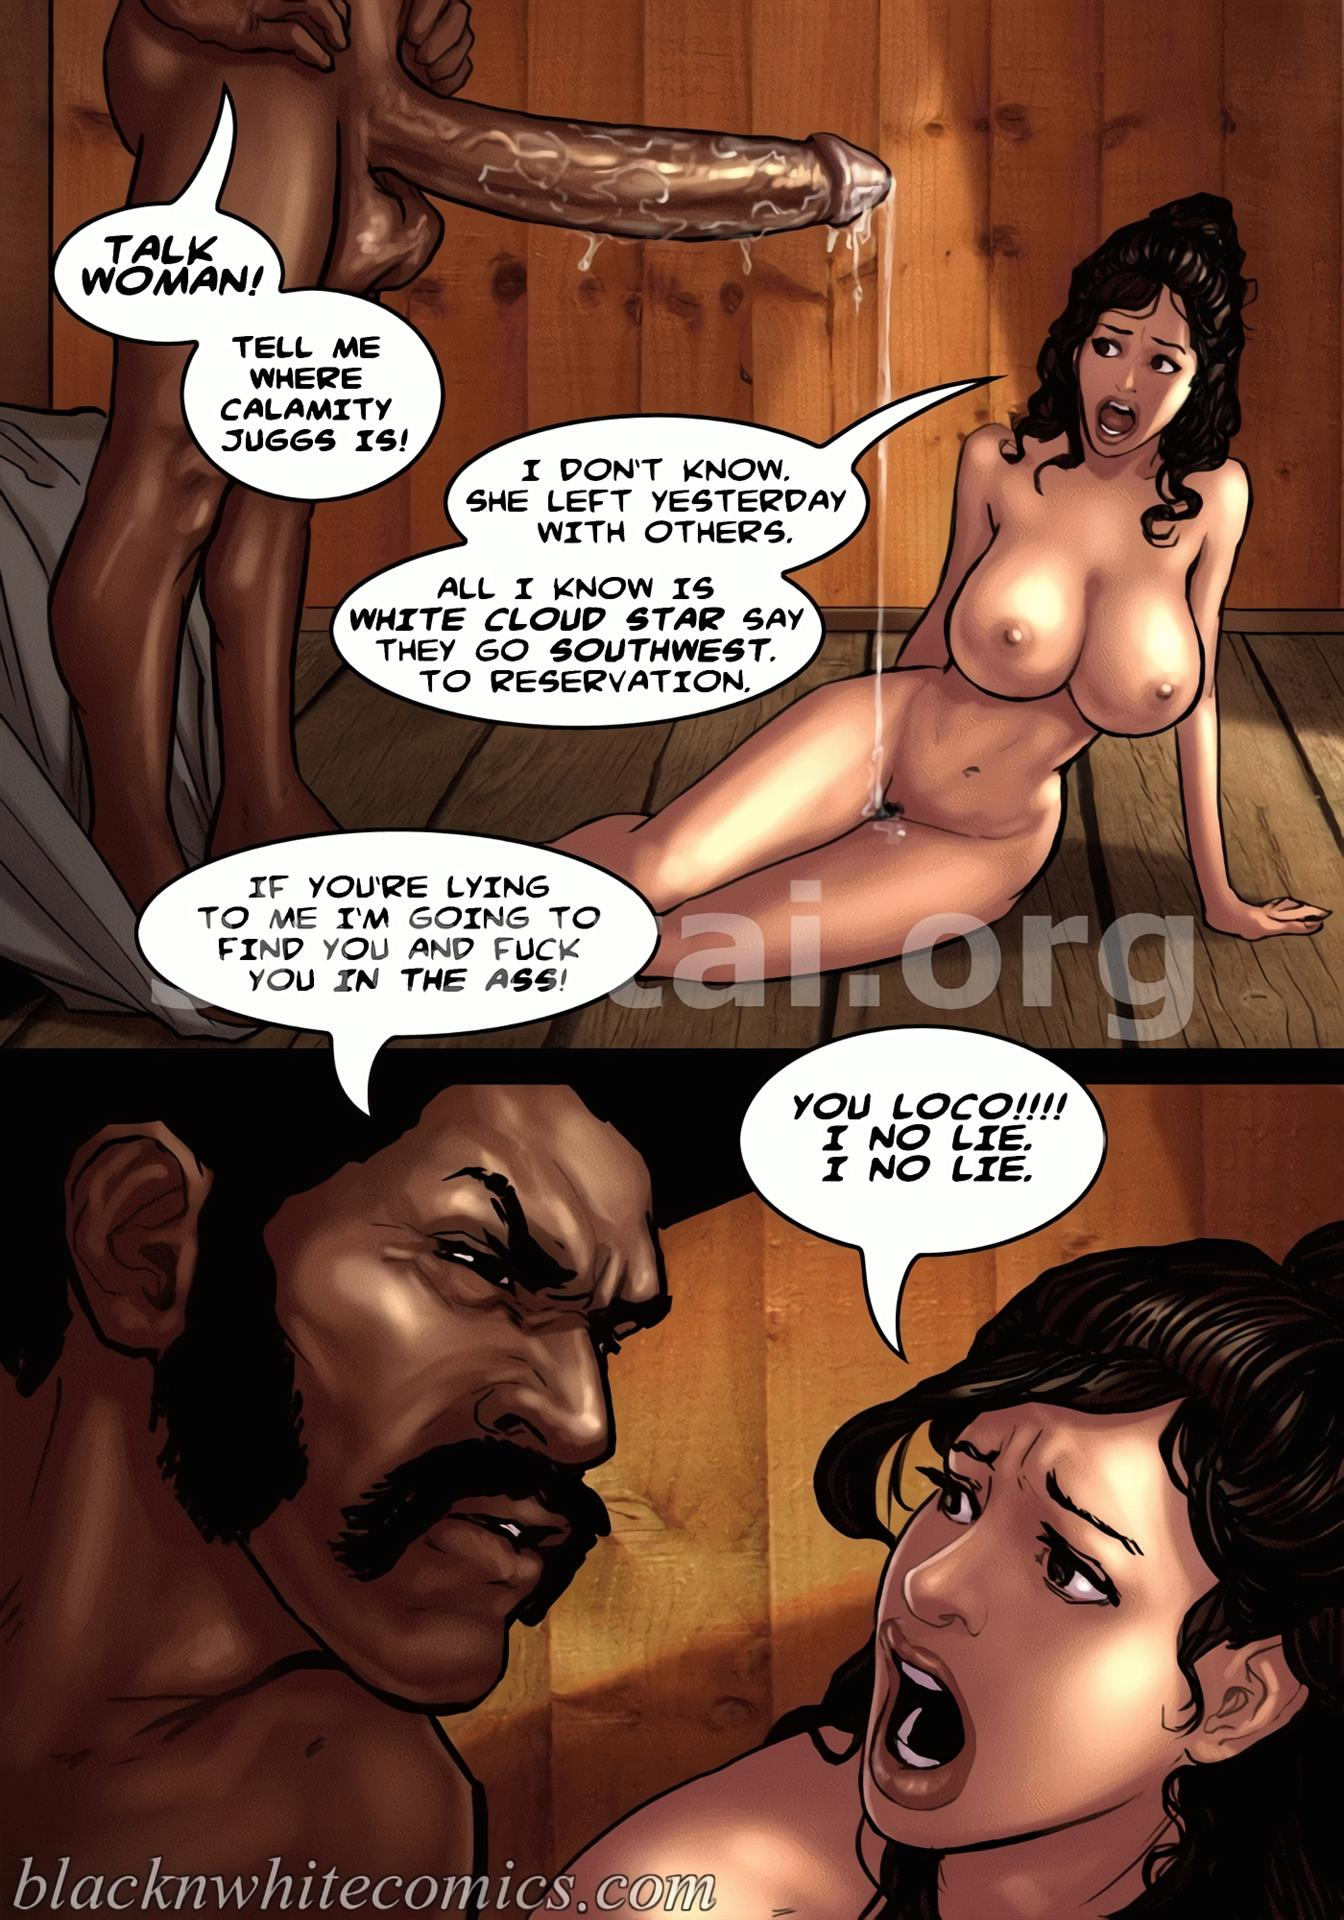 True Dick [BlackNwhite] - Foto 39